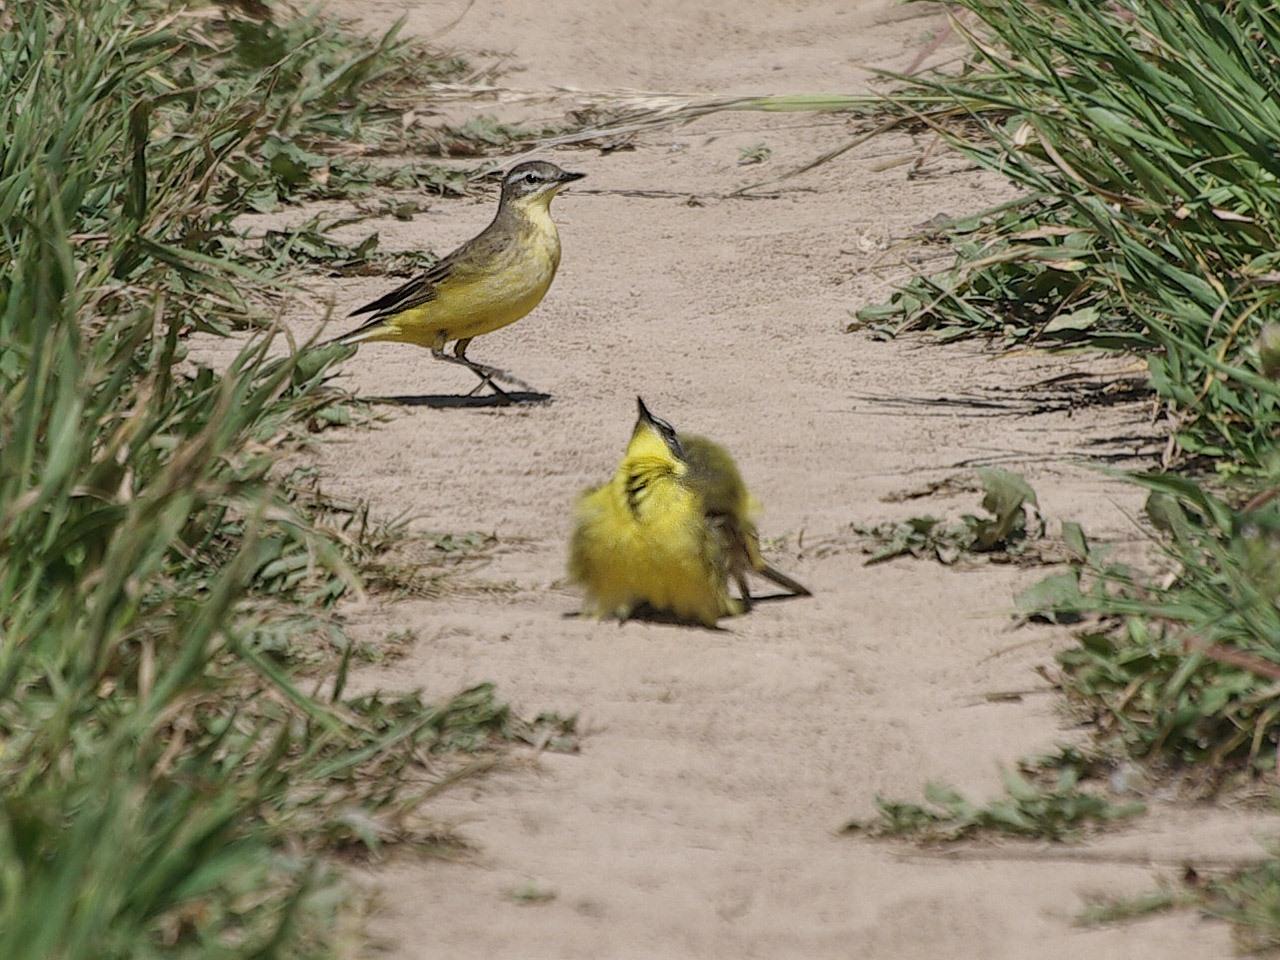 Жёлтая трясогузка (Motacilla flava). Автор фото: Юрий Семенов